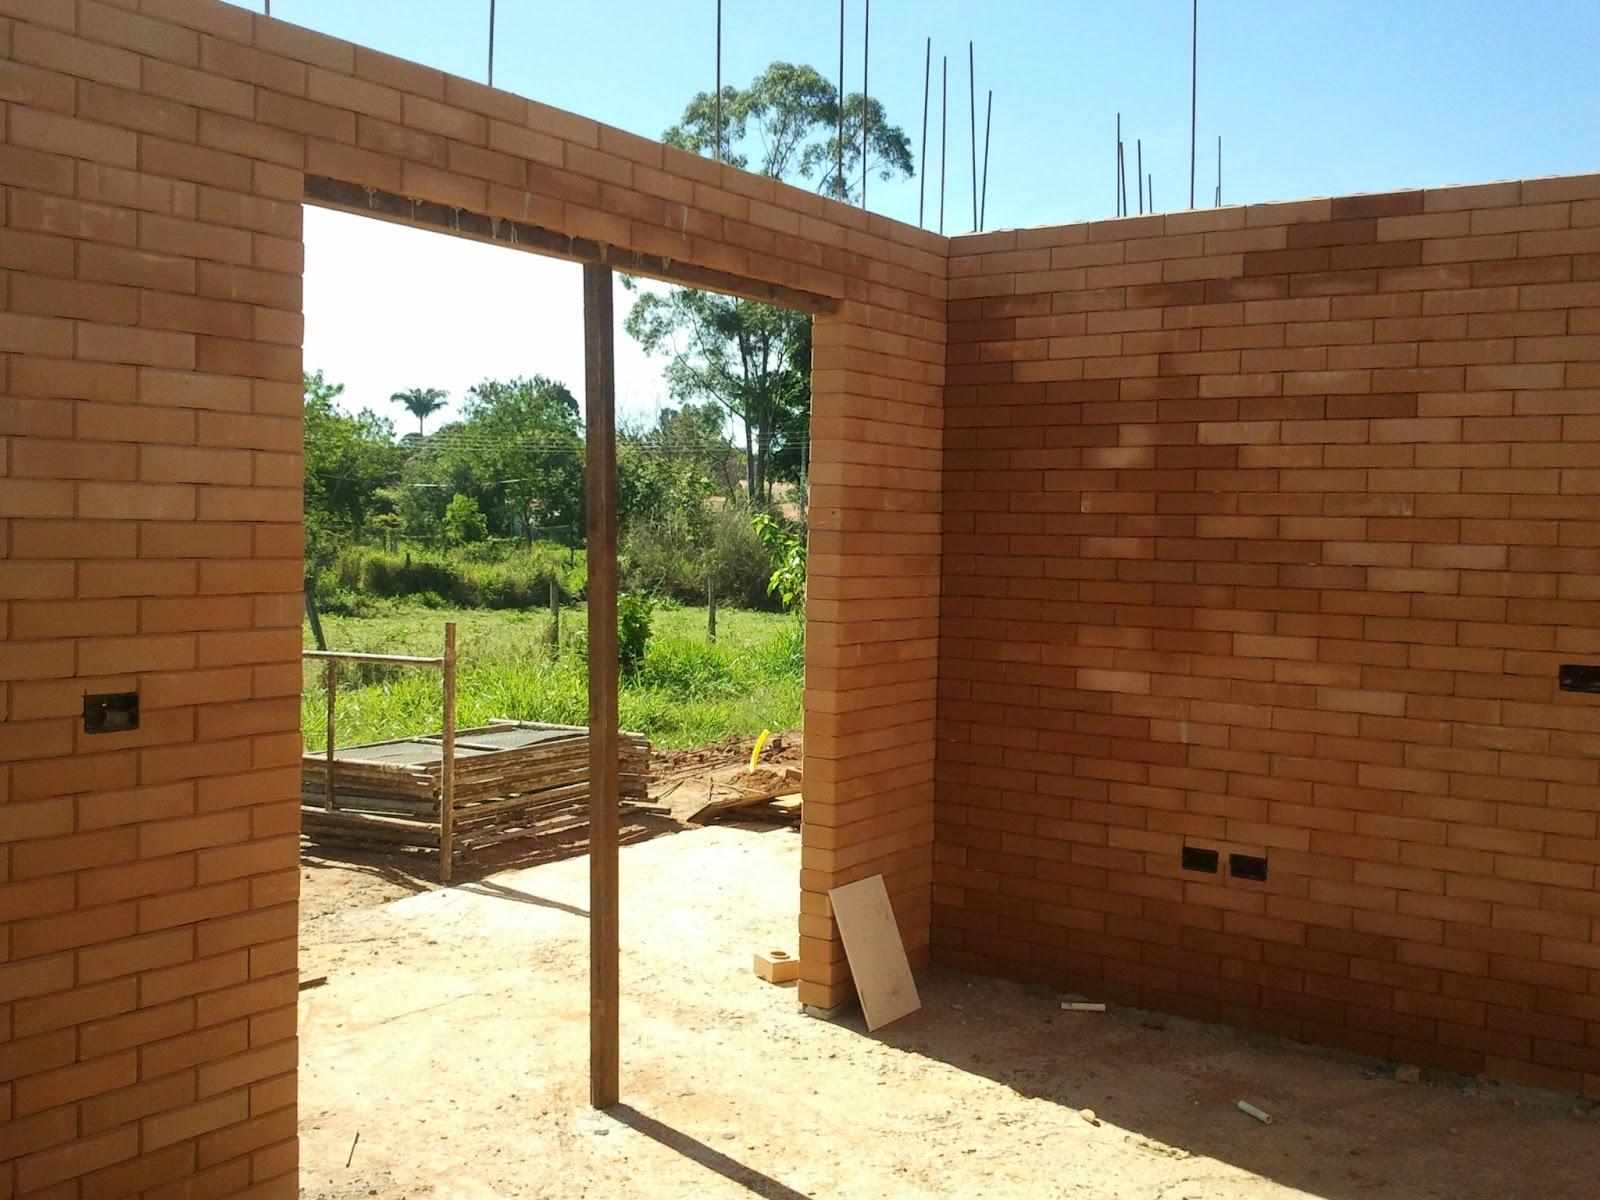 Construindo e Ampliando com Tijolo Solo cimento / Ecológico  #1B7CB0 1600 1200